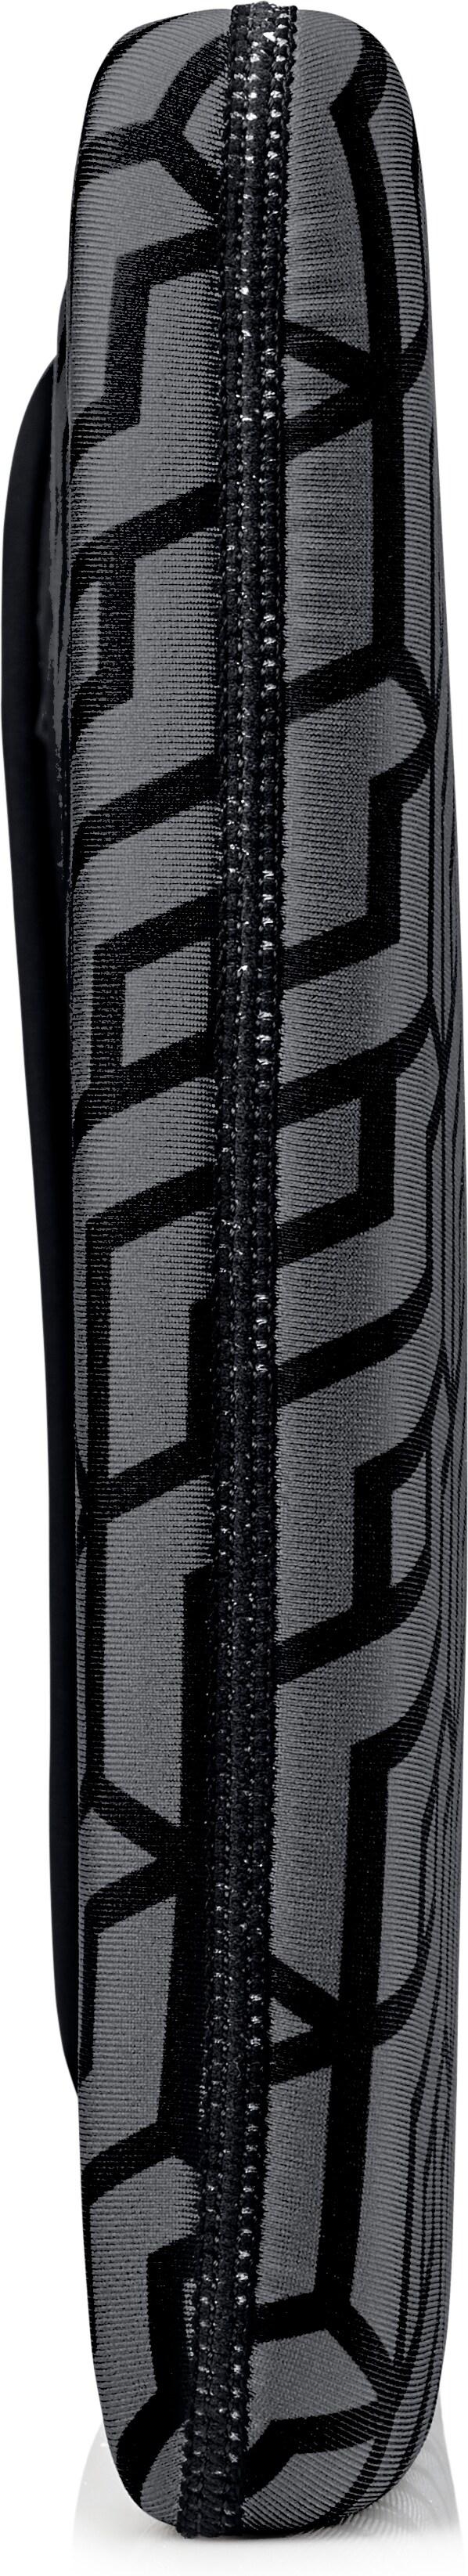 "Chroma Geo Rev Sleeve (14"", zwart/grijs)"